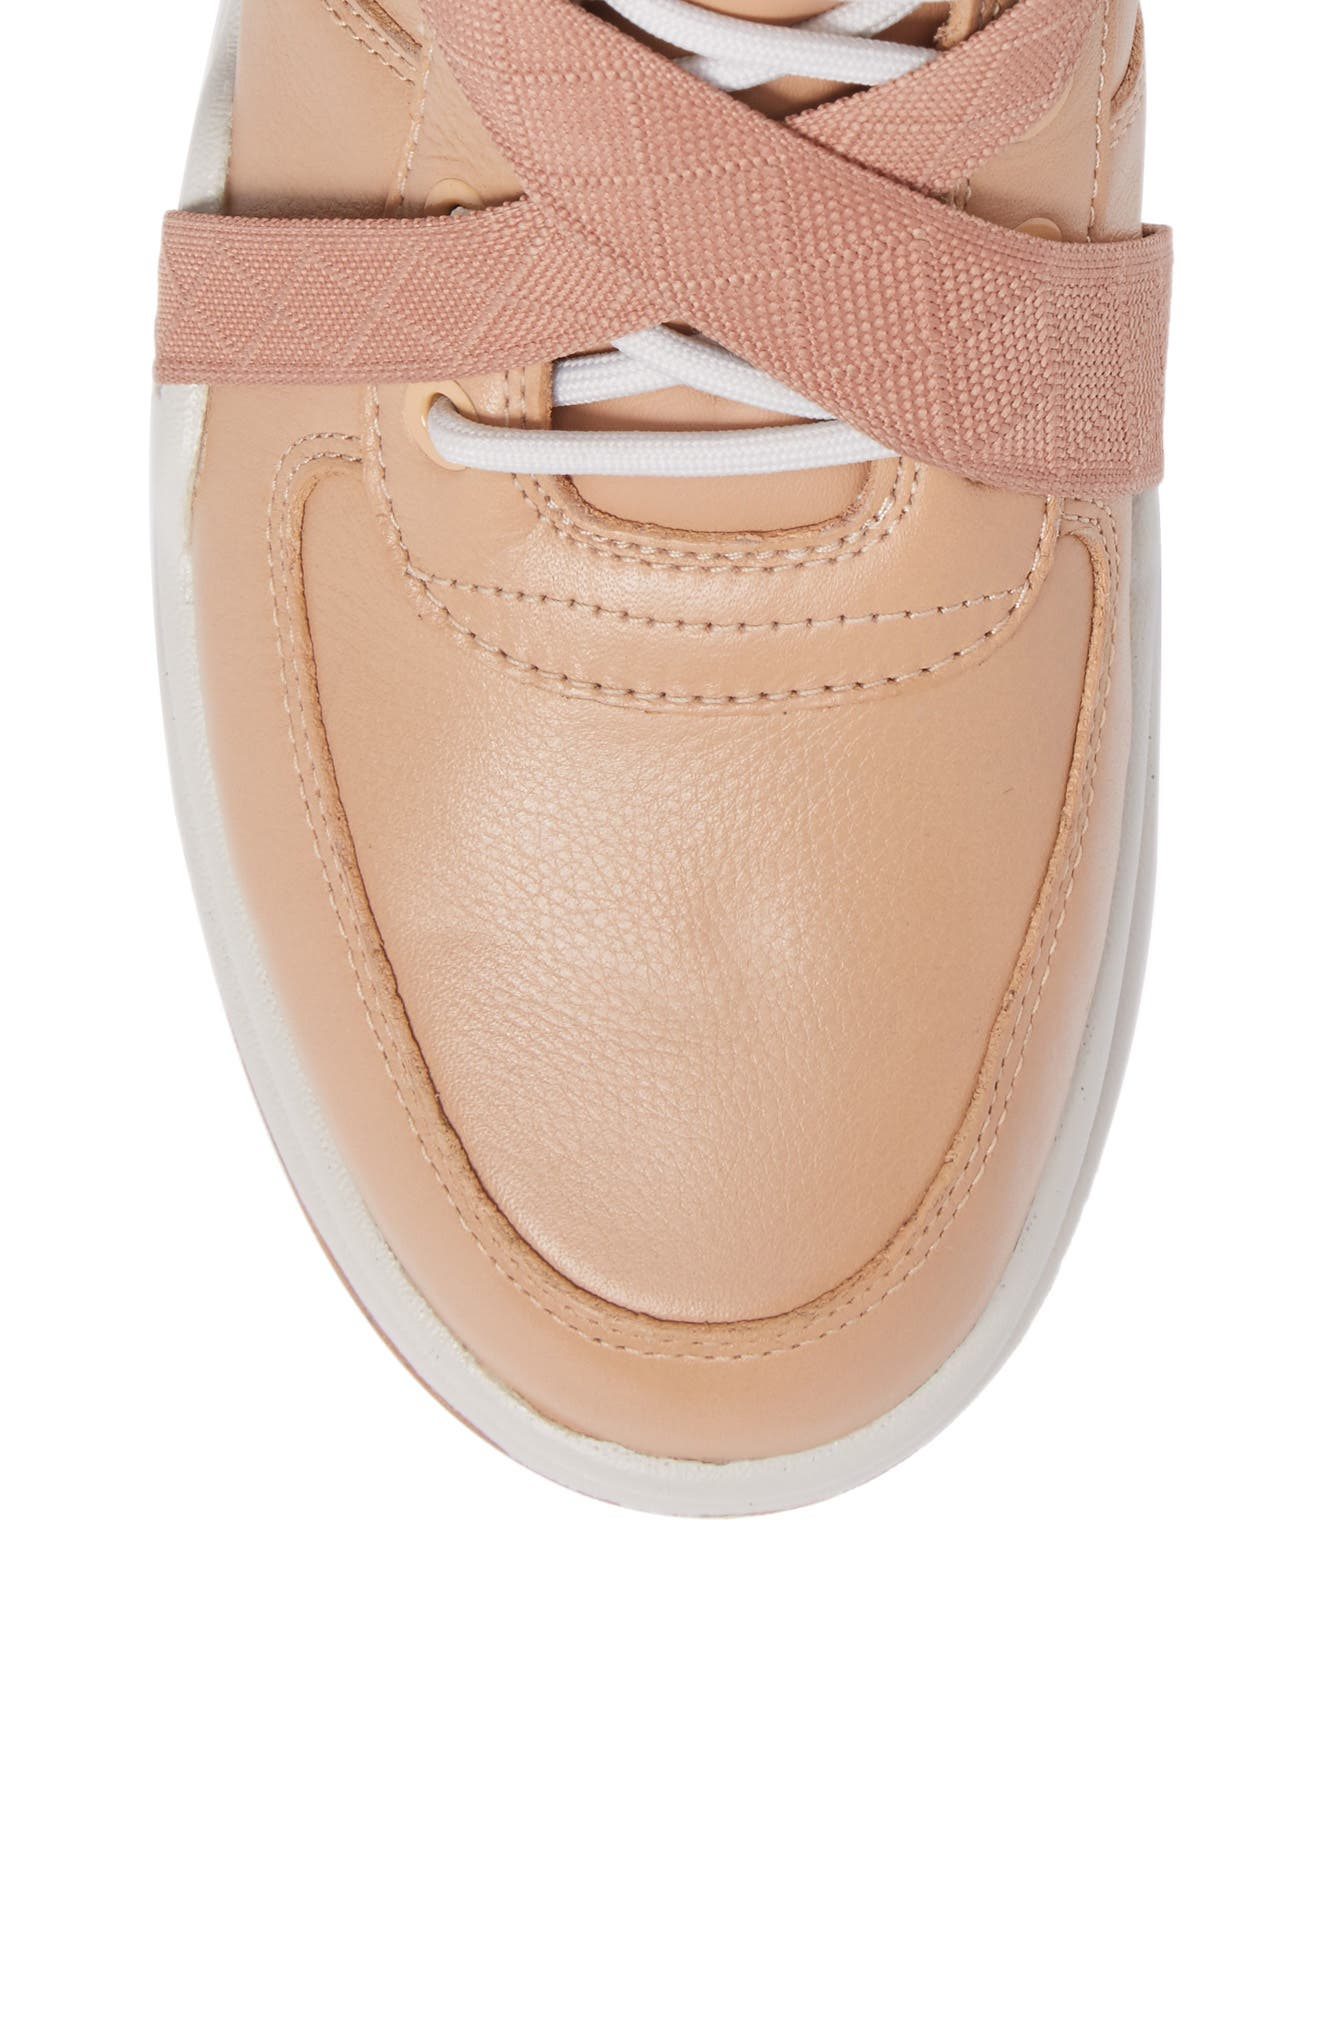 Air Max Goadome Sneaker Boot,                             Alternate thumbnail 5, color,                             Tan/ Tan/ Light Bone/ Clay